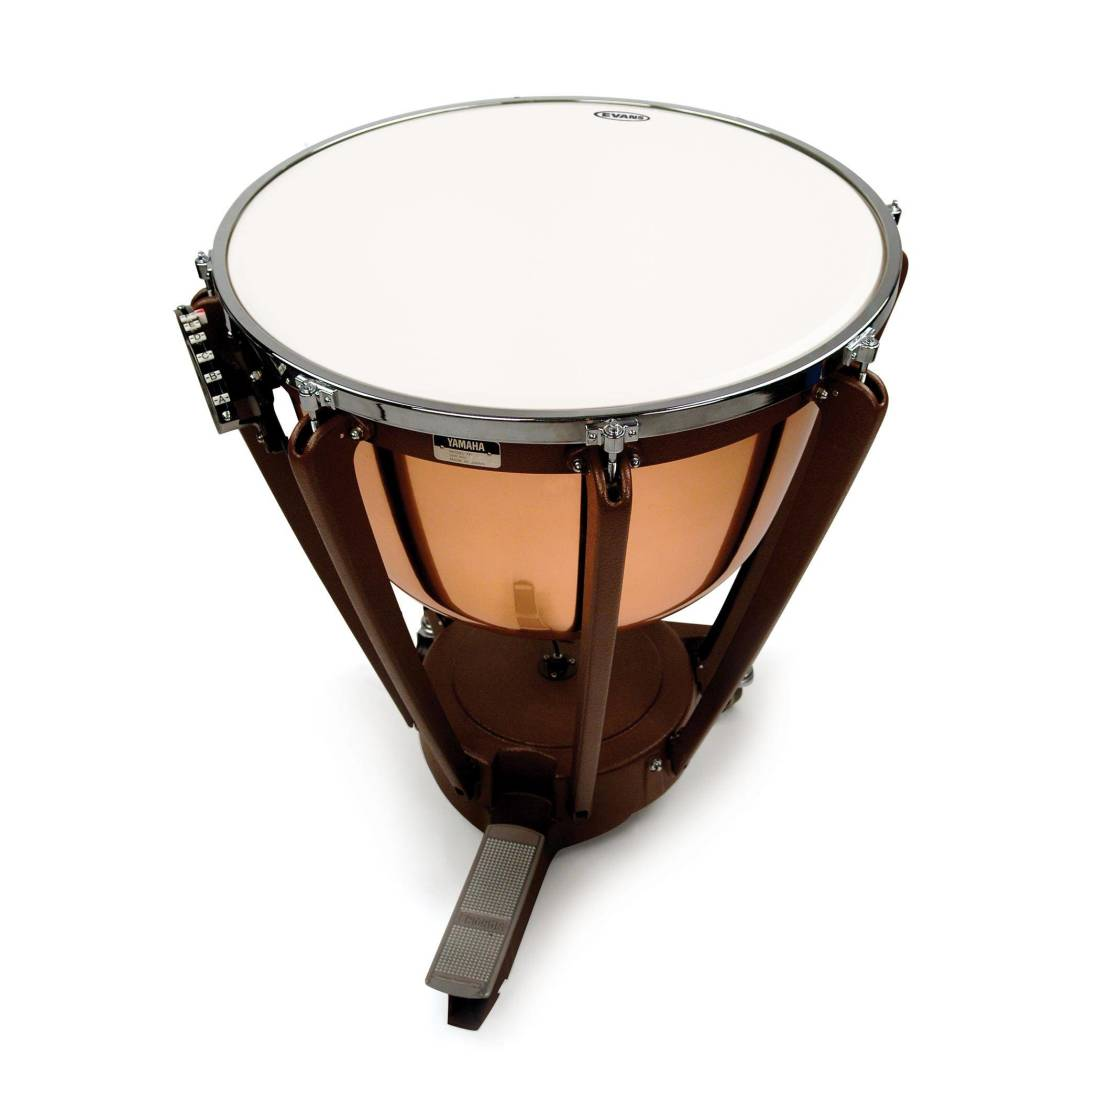 evans orchestral timpani drum head 29 inch long mcquade musical instruments. Black Bedroom Furniture Sets. Home Design Ideas